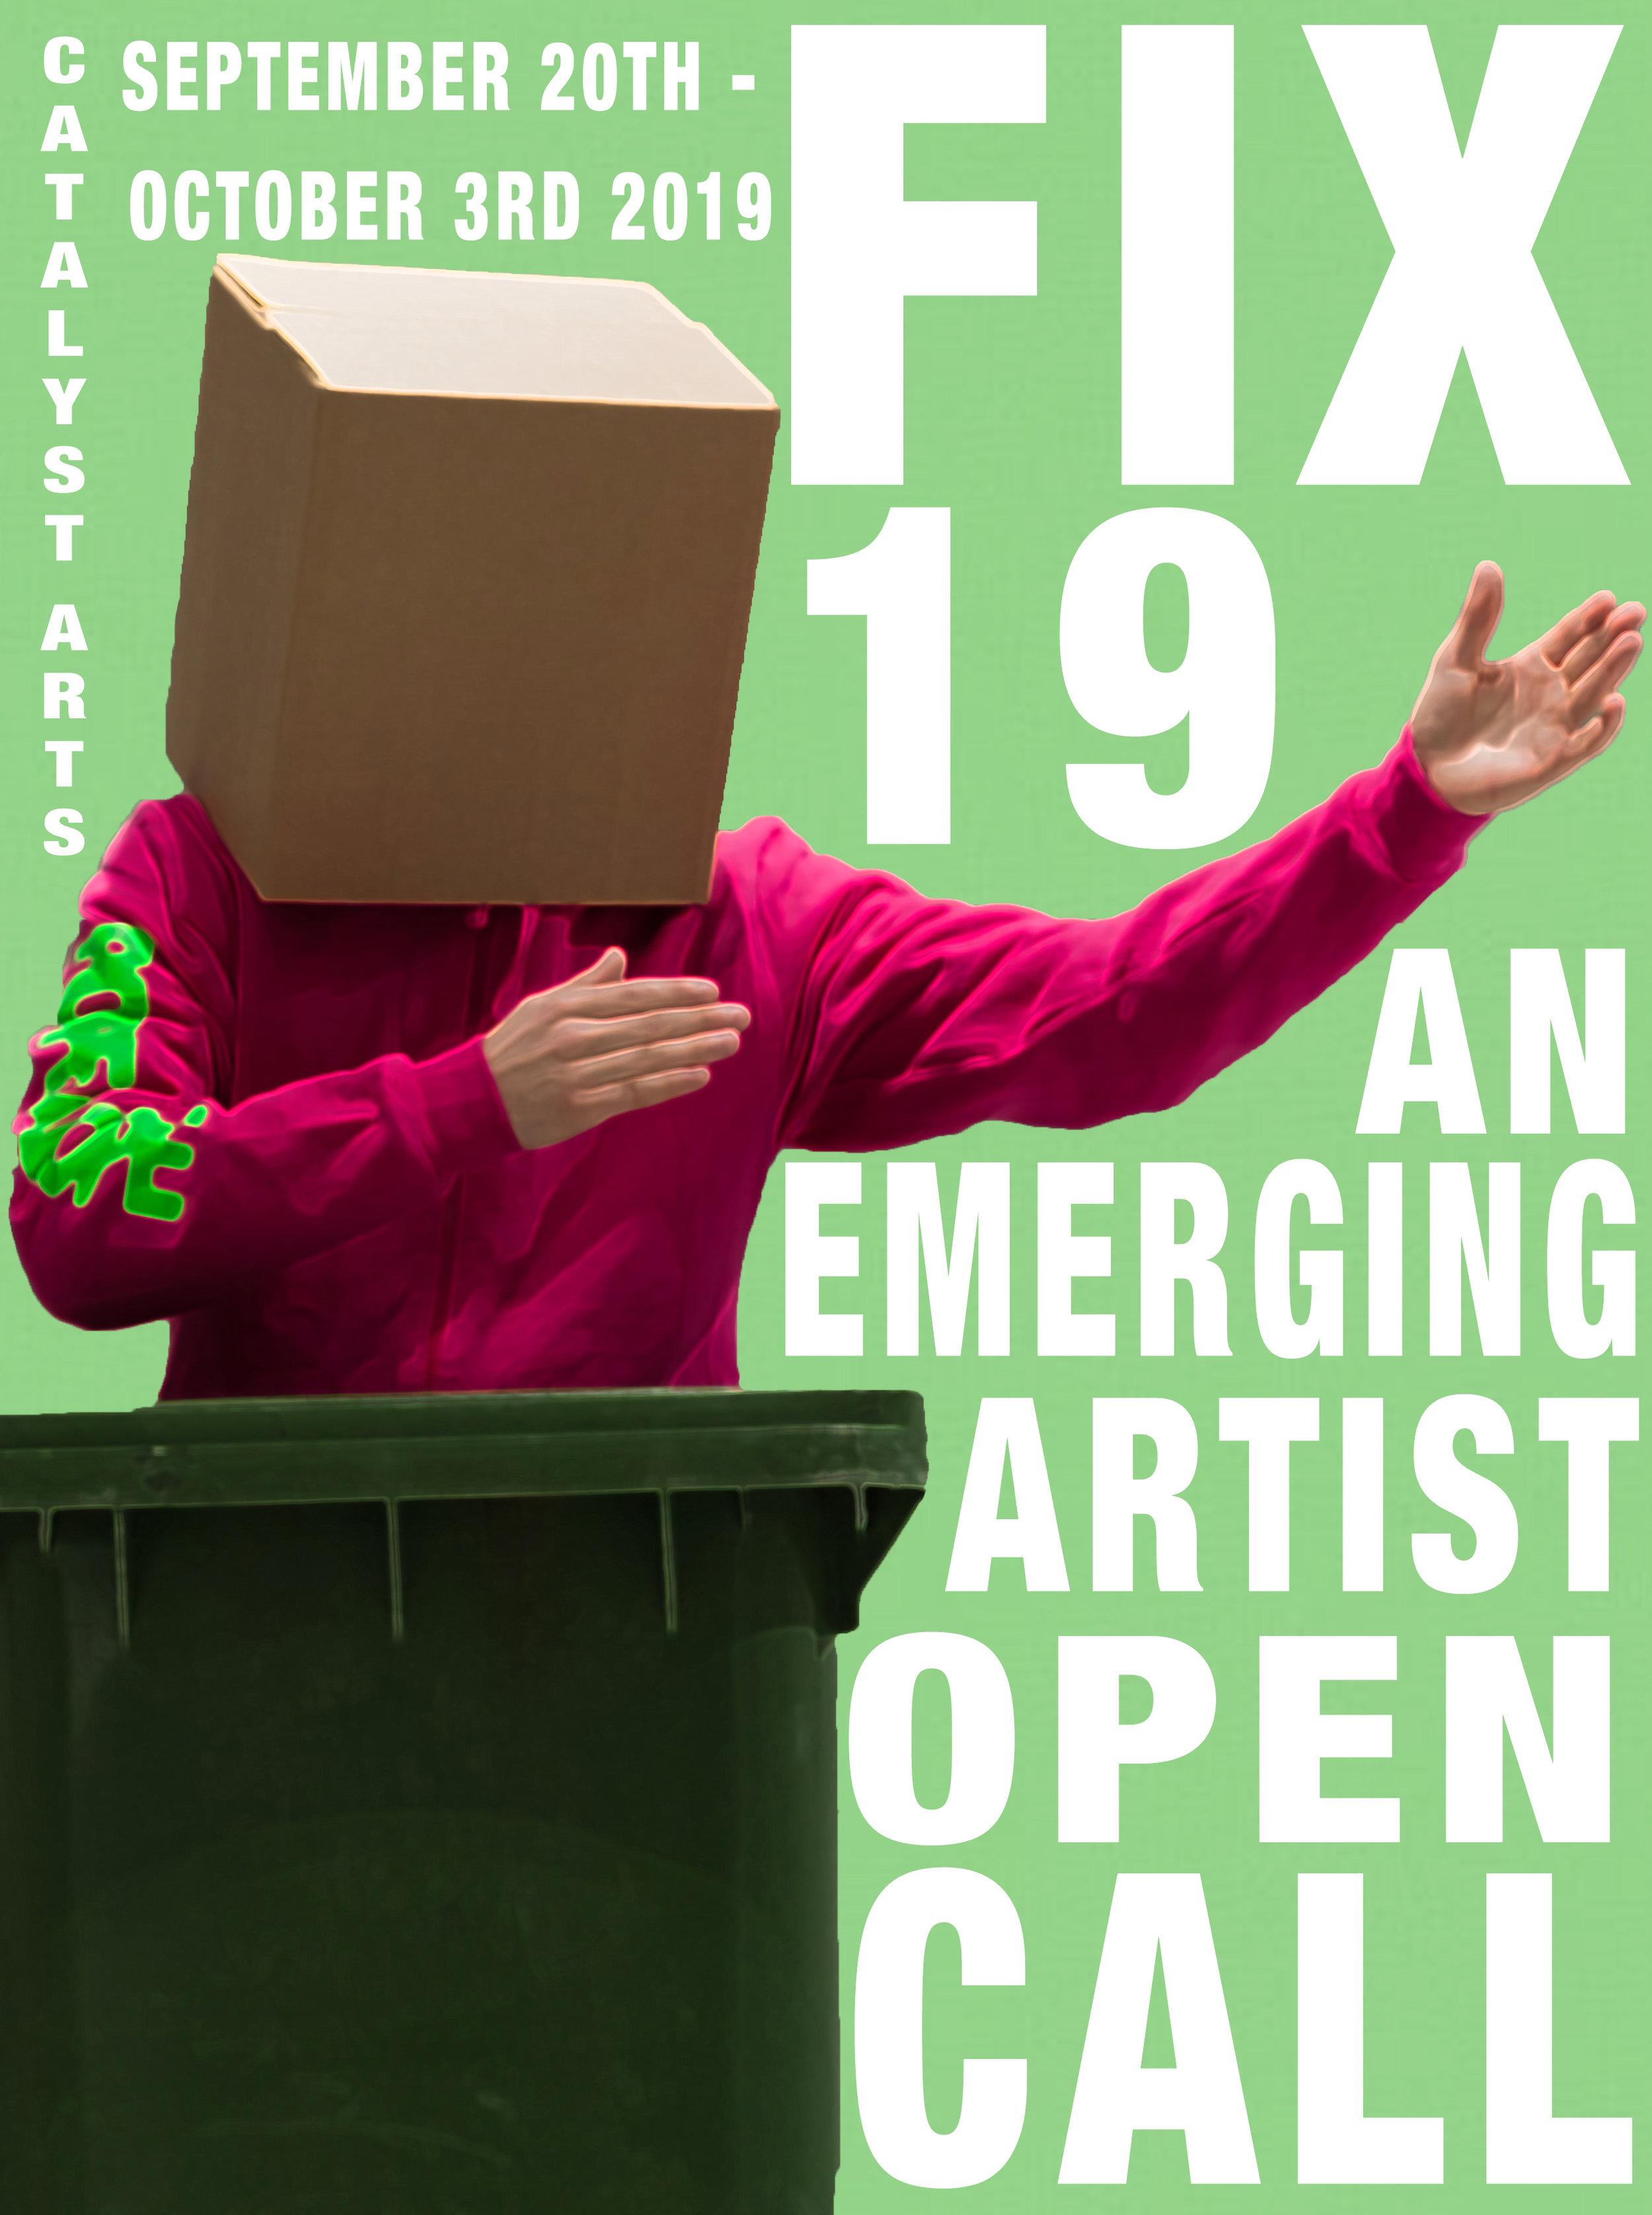 FIX 19 EMERGING.jpg